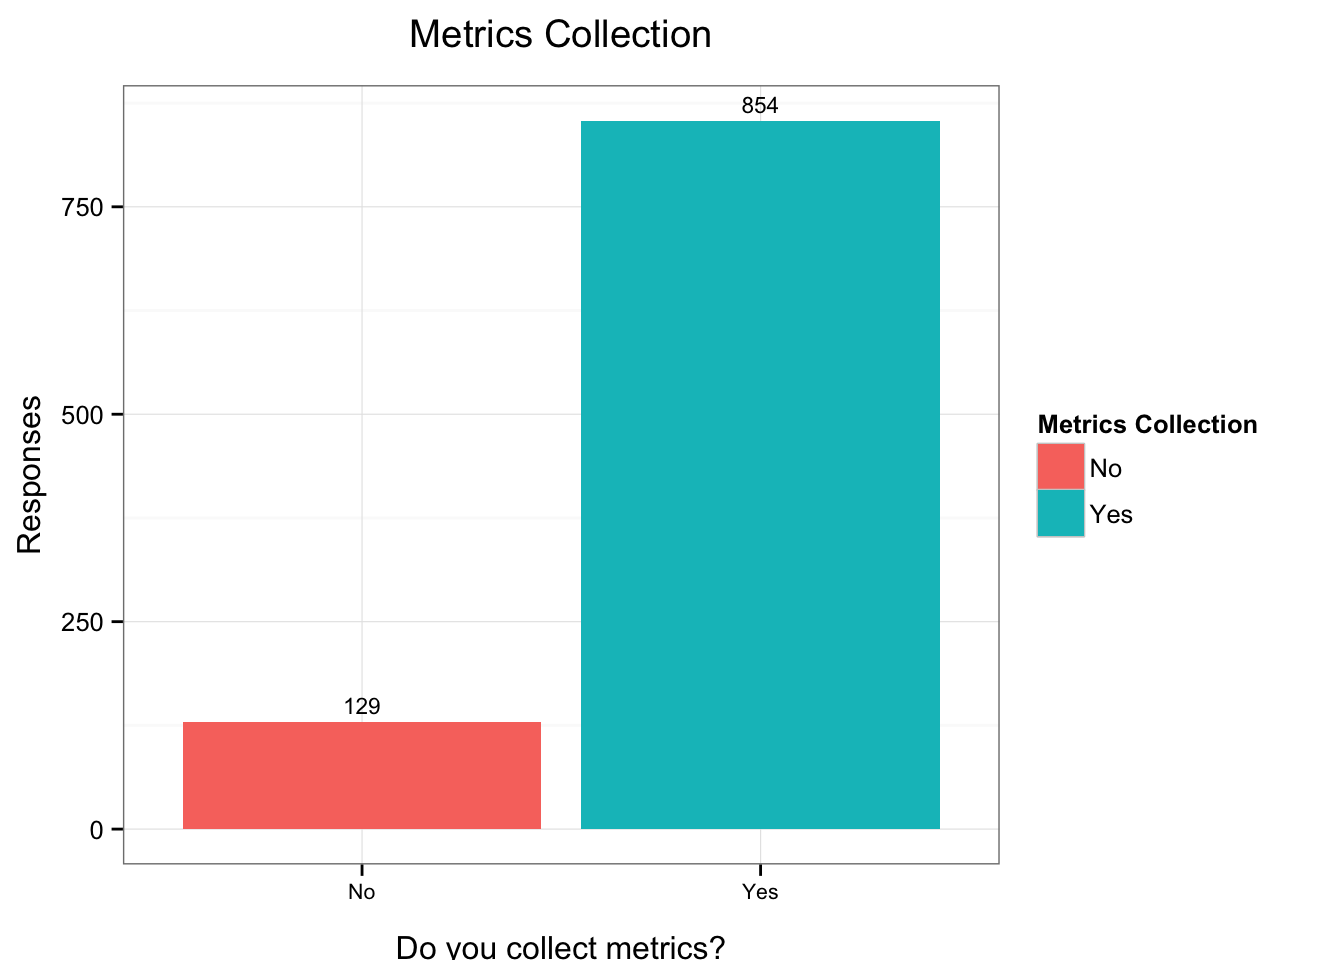 Metrics Collection